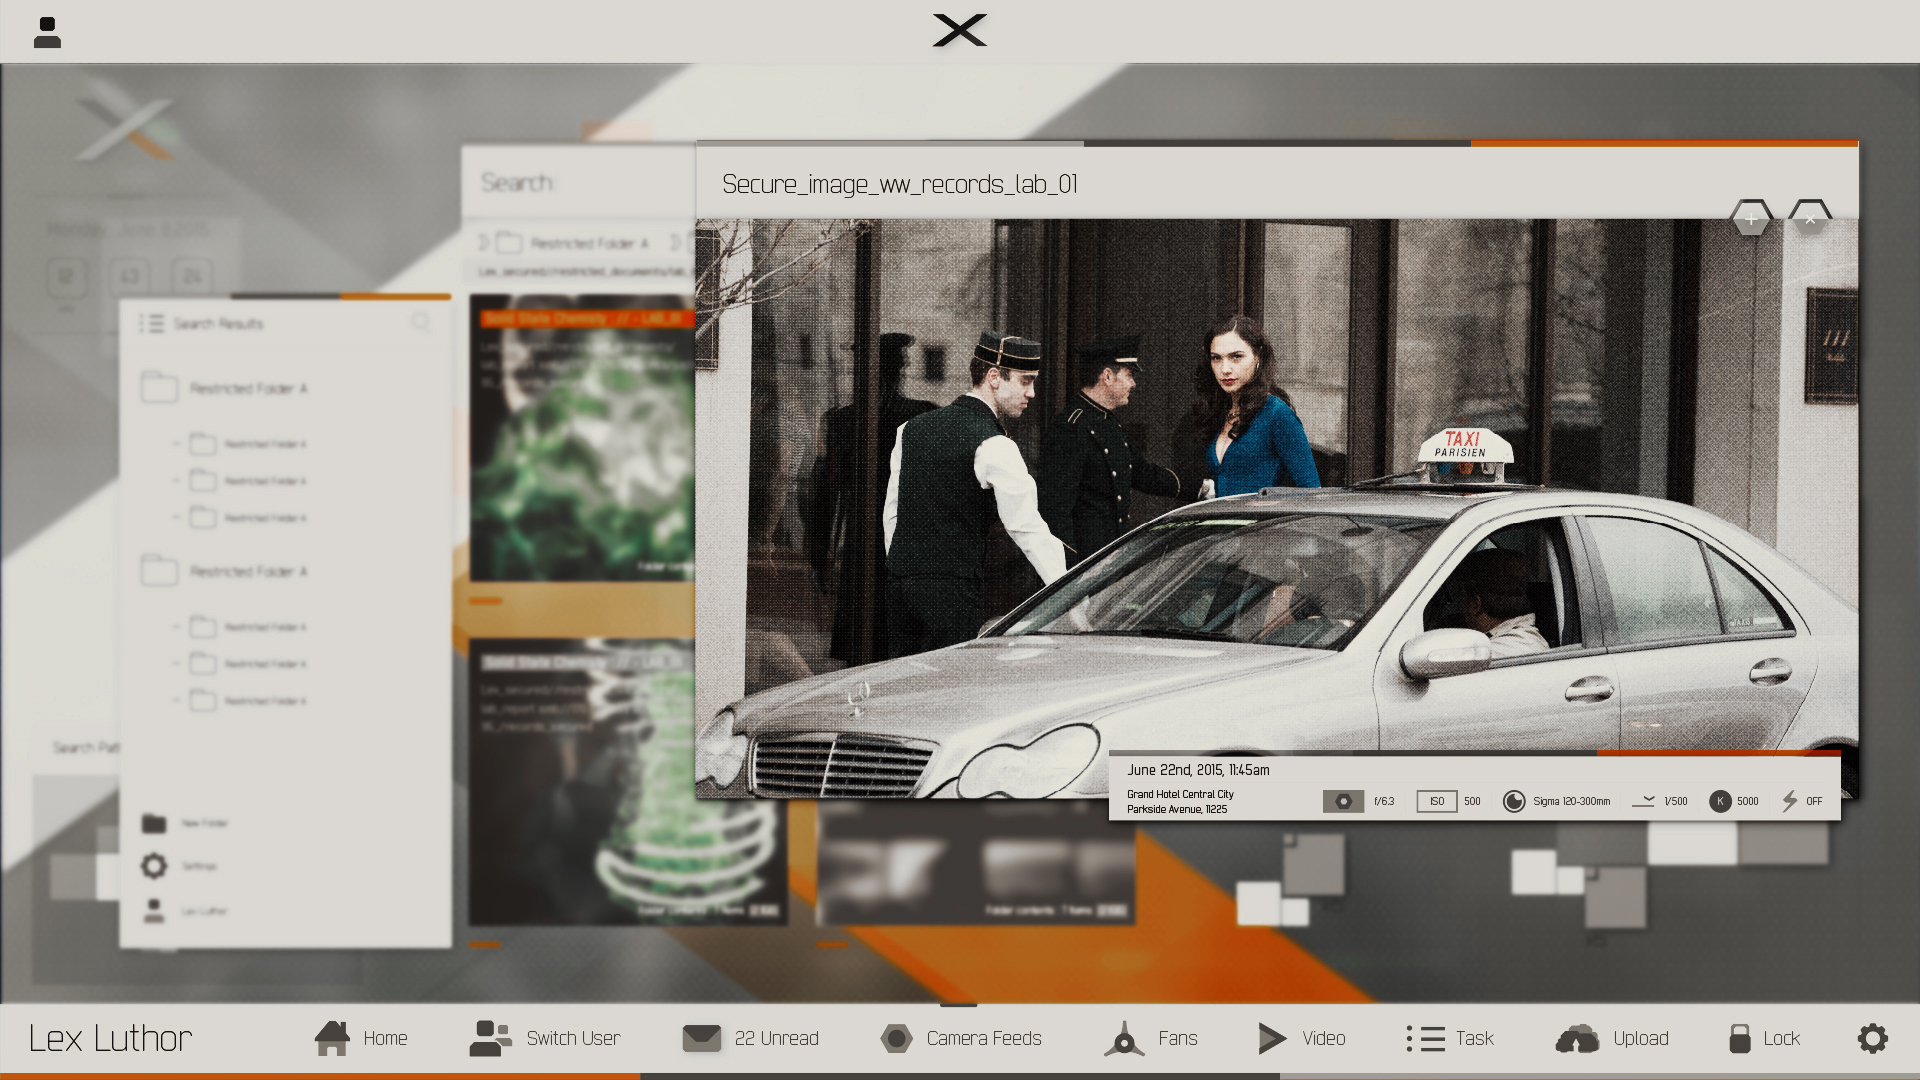 S&M_BC0368_Preview_window_v02 copy.jpg